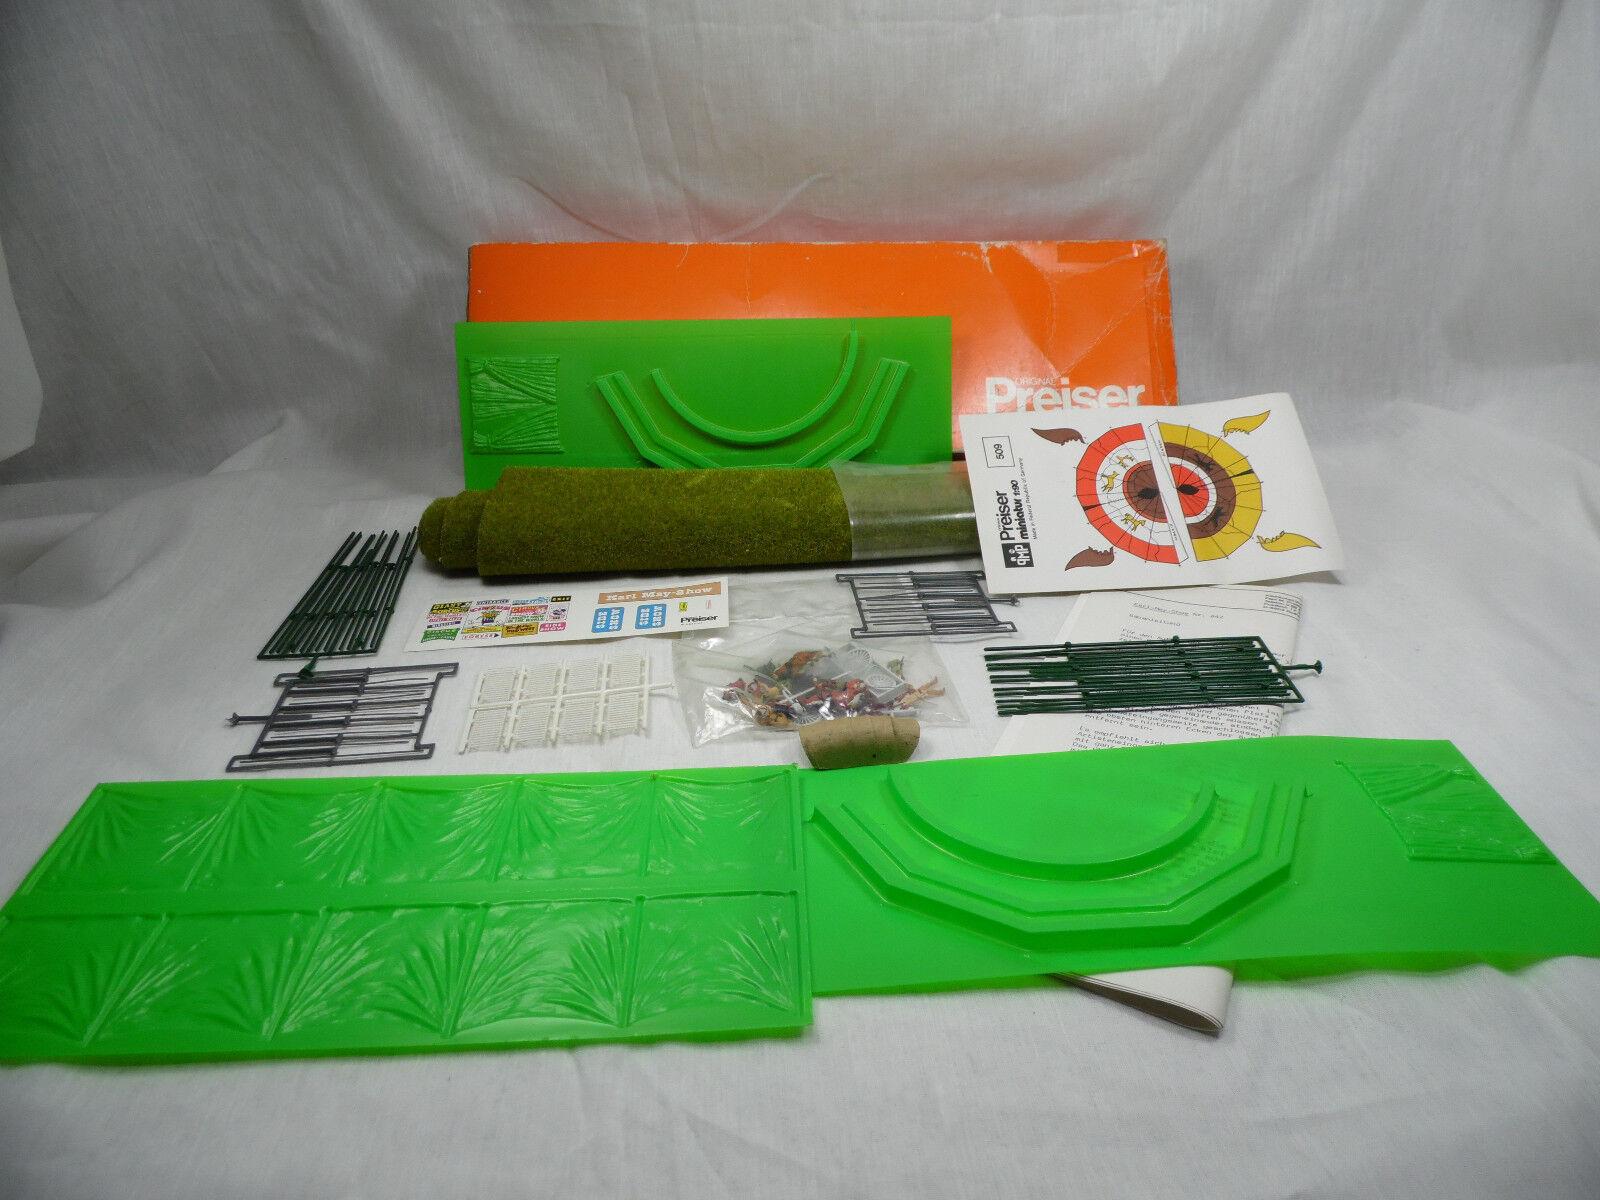 H1205, Preiser 642 Karl May Wild West Show Winnetou Figuressatz mint BOX 1 87 H0